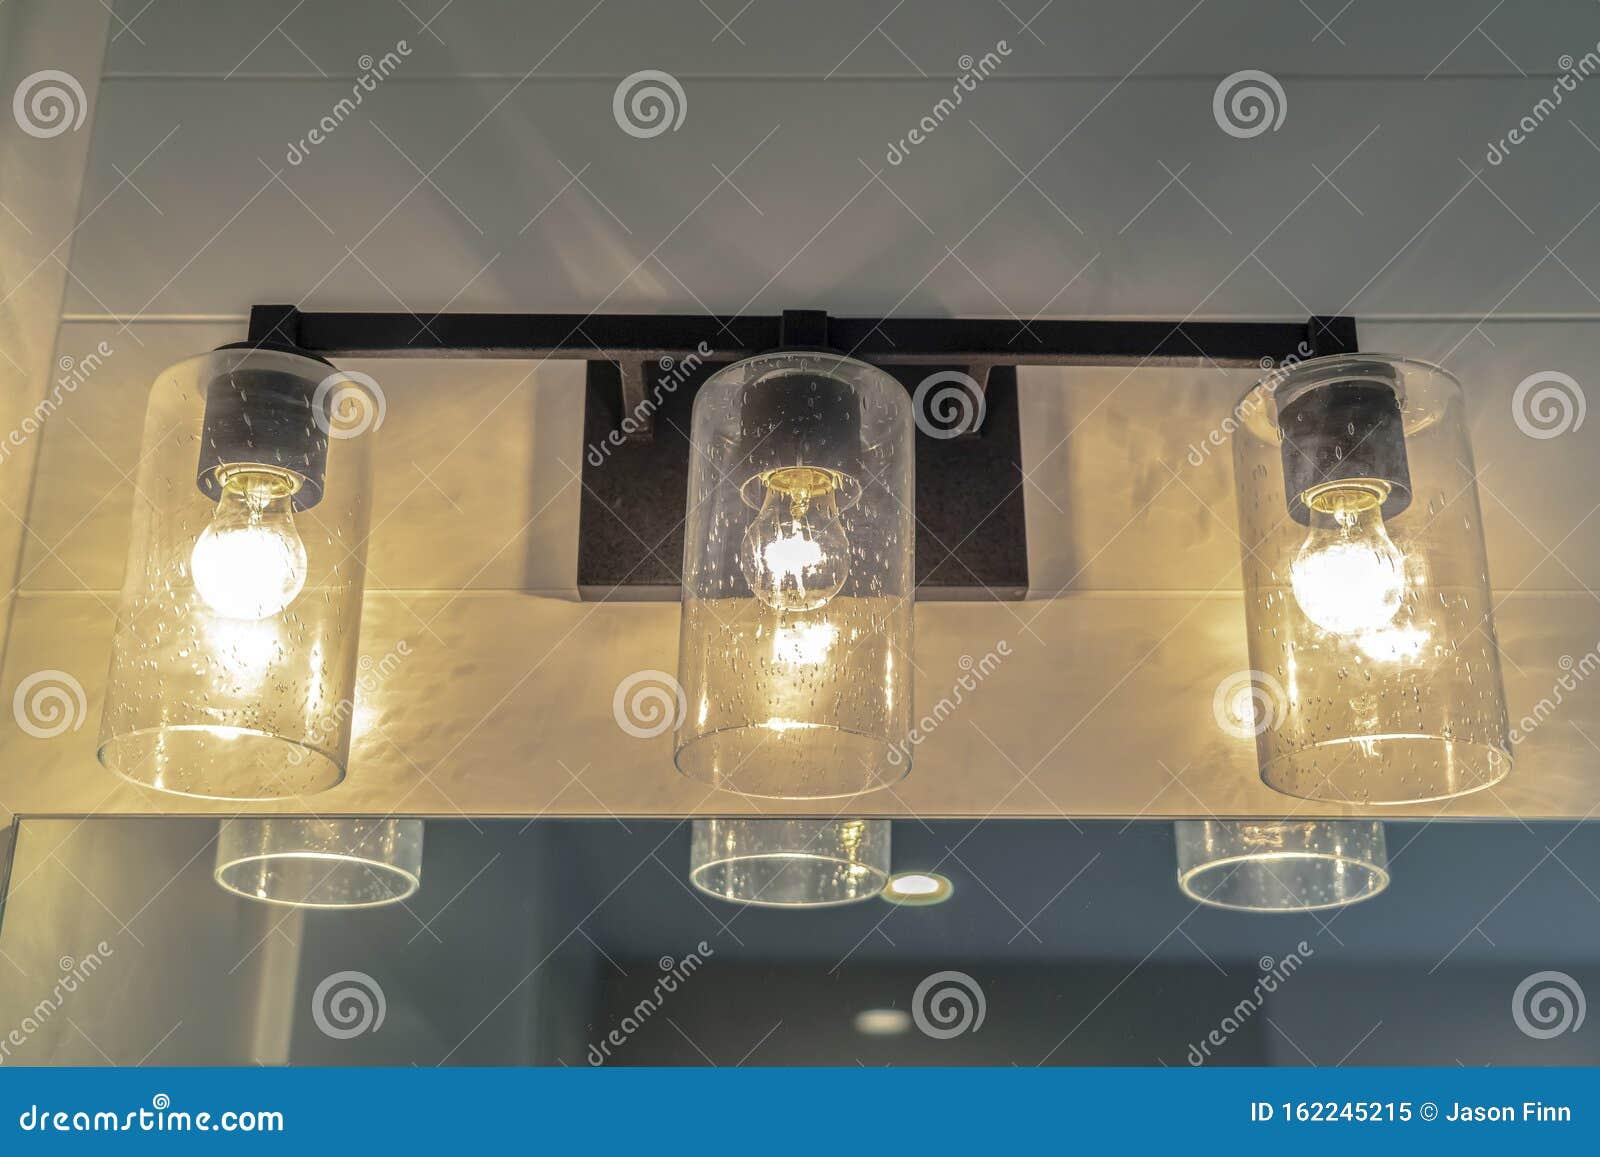 Close Up Of Contemporary Bathroom Mirror Lights Stock Image Image Of Illuminated White 162245215